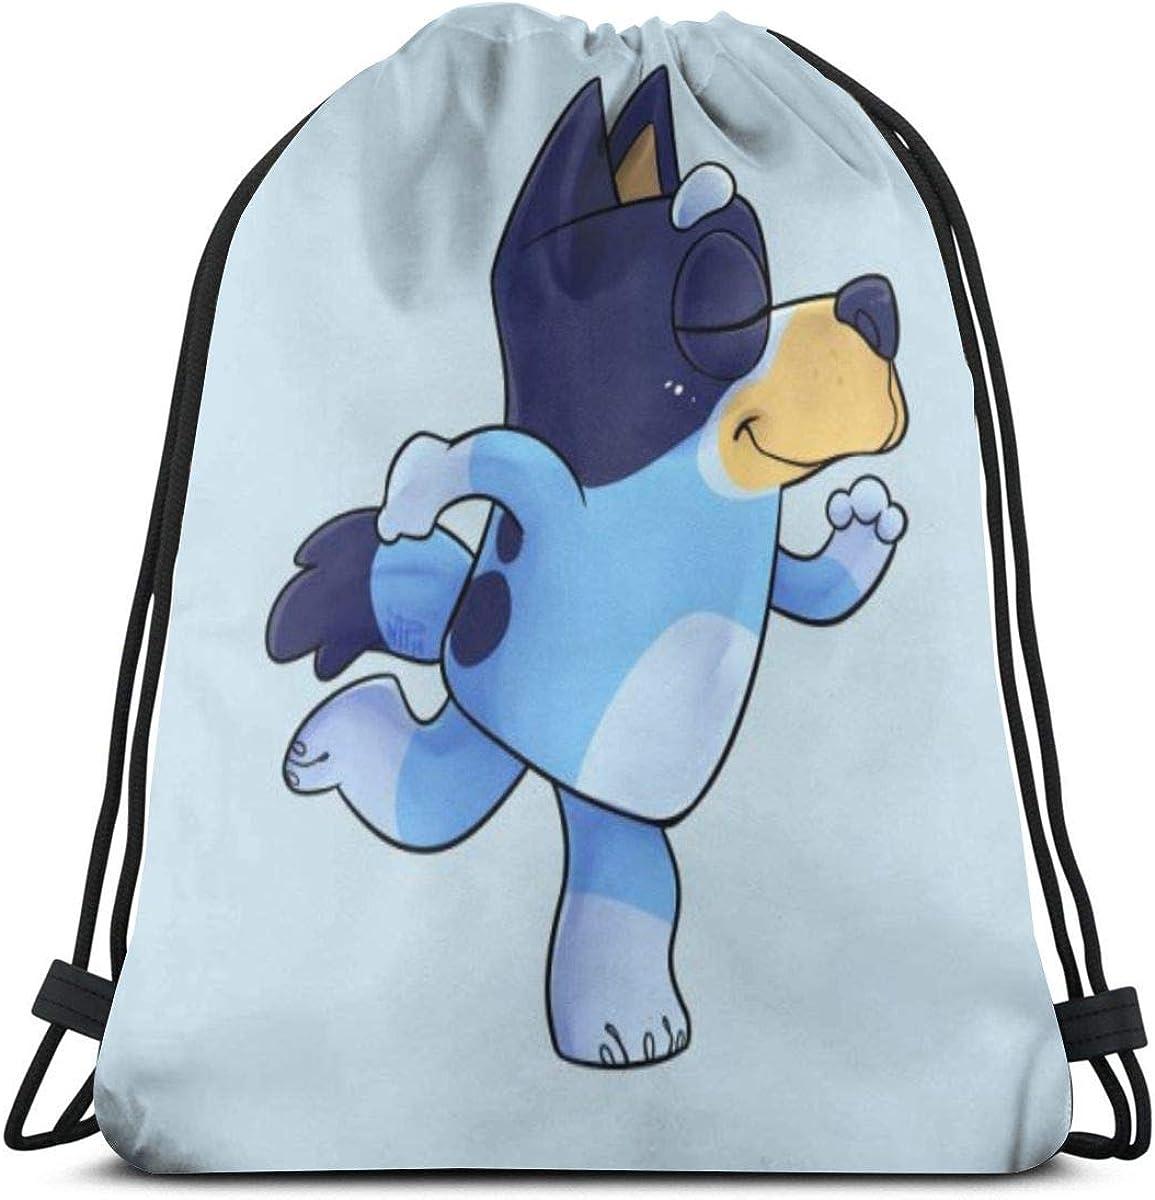 GHK Blueys-Dance-cartoon Waterproof Drawstring Backpack Bulk Bundle Beachu Sackpack Bag For Men And Women Kids